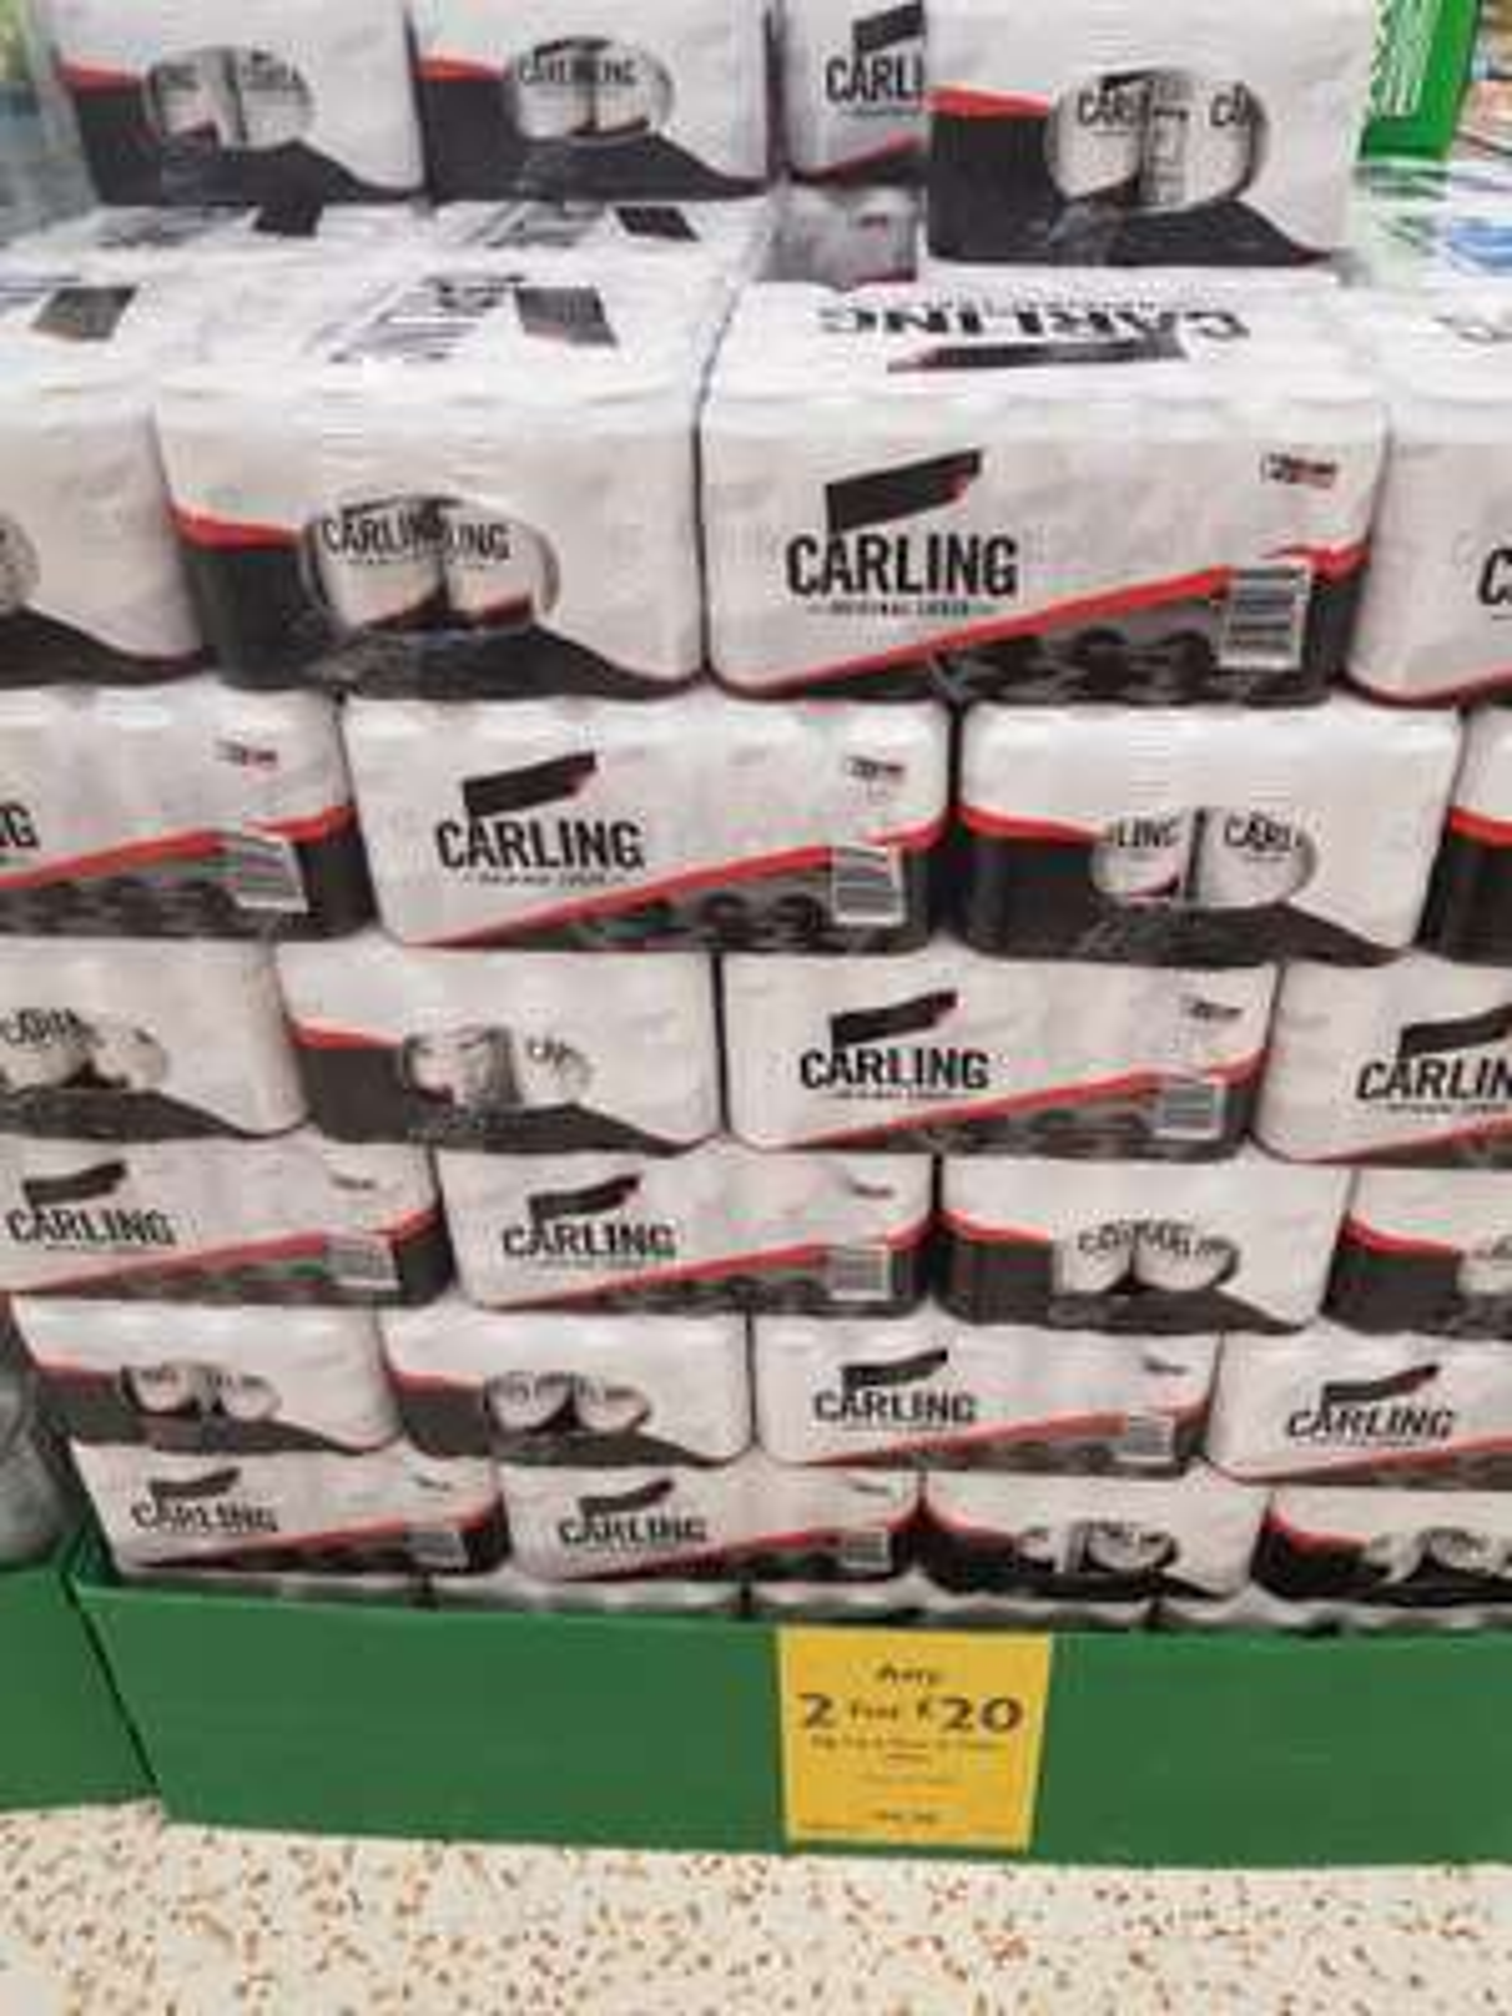 Buy 2 for £20 on big pack beer and cider @ Morrisons